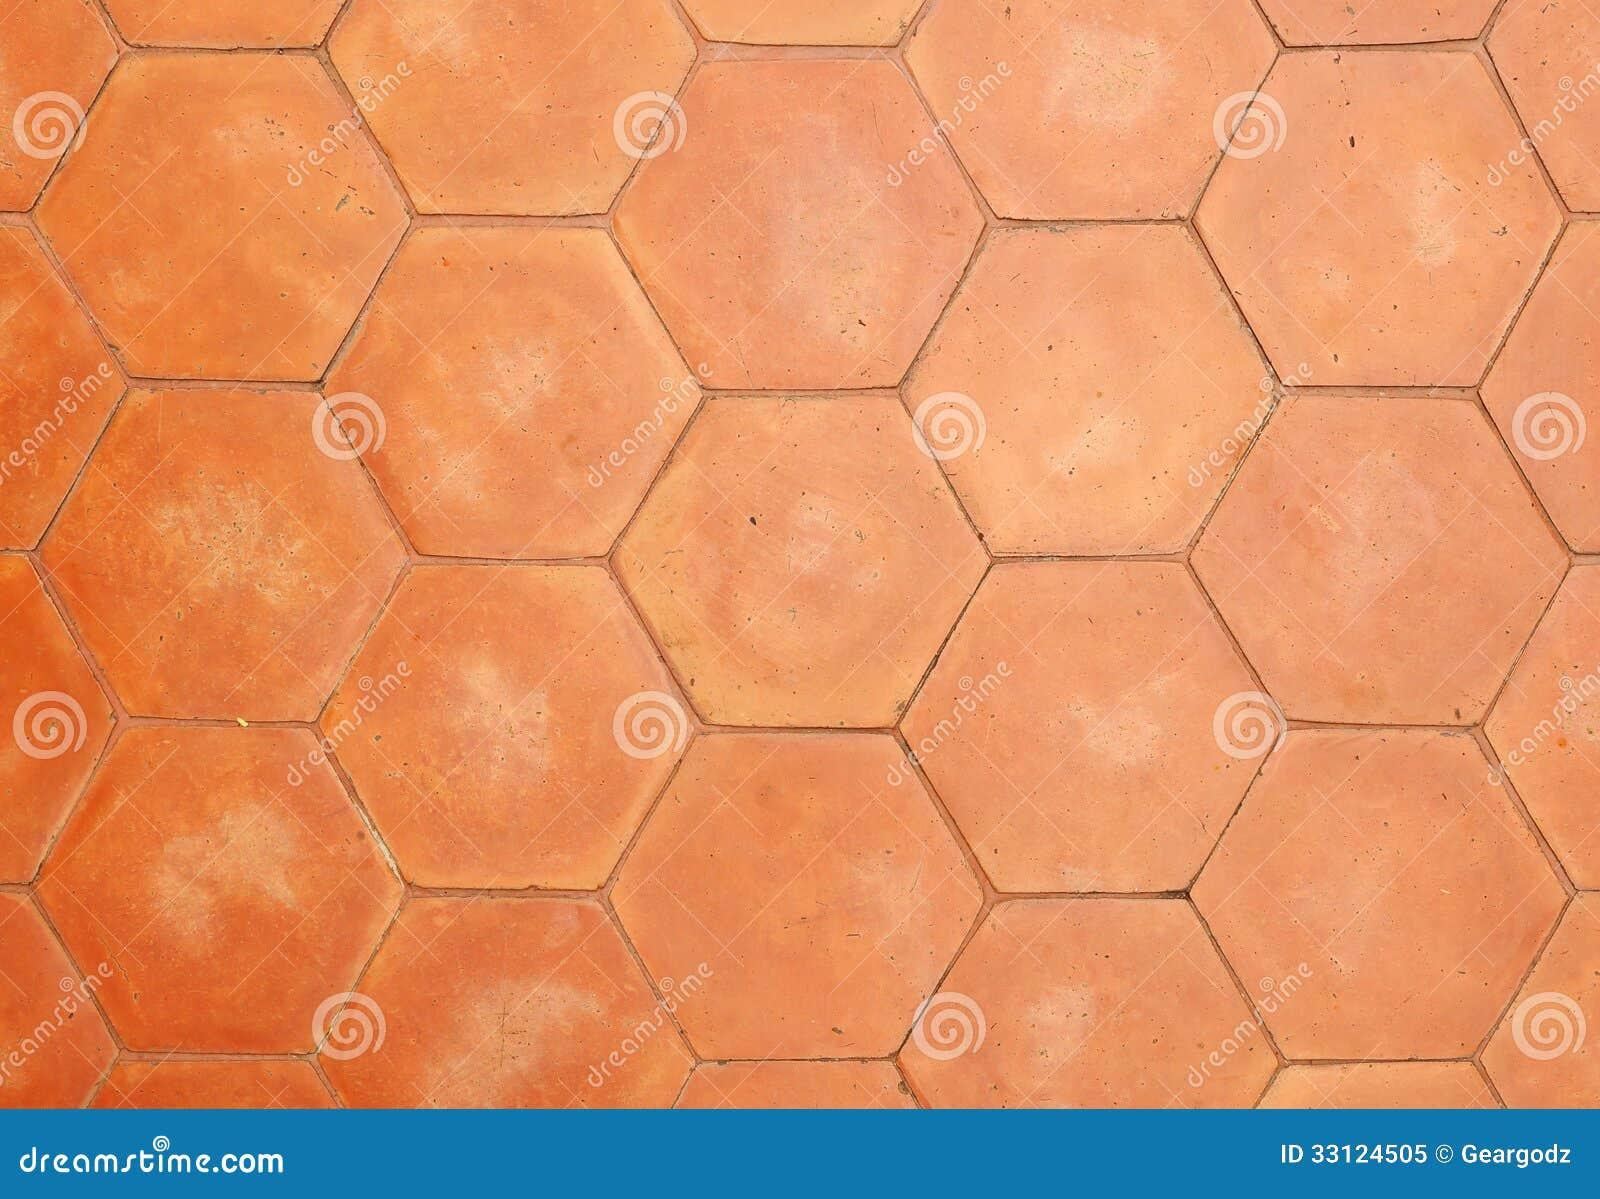 Piastrelle Esagonali Bianche : Stock piastrelle esagonali piastrelle esagonali o a nido d ape